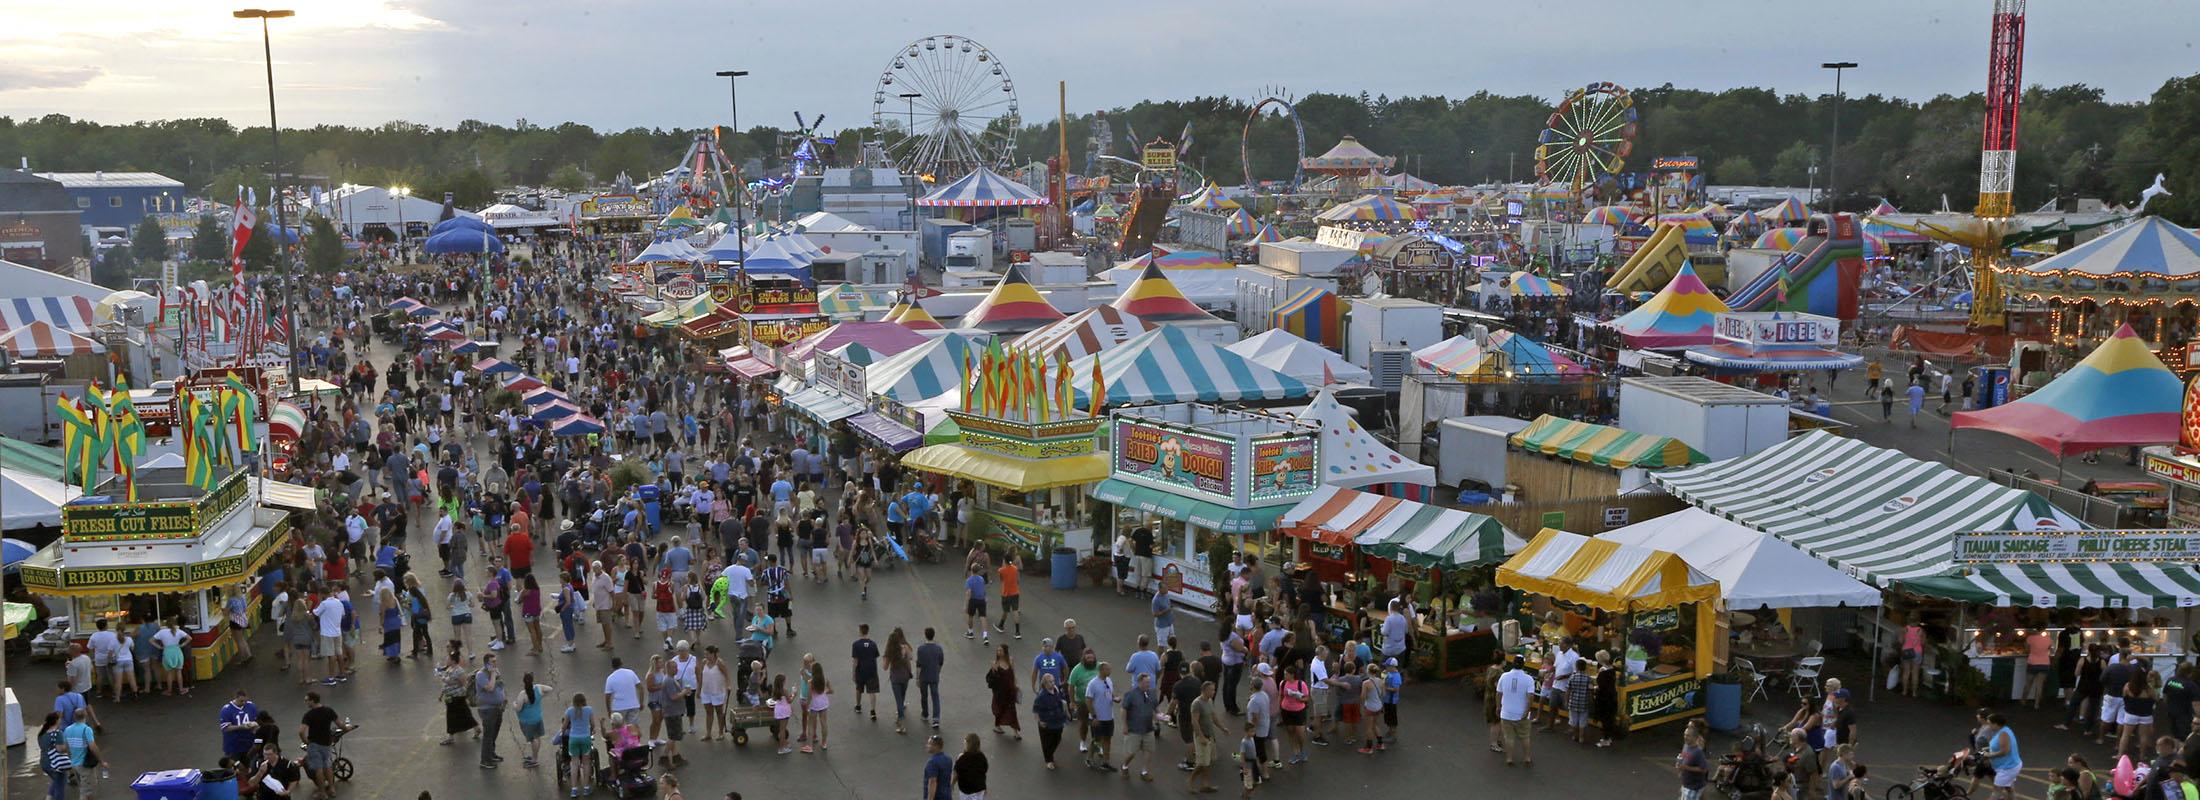 The Erie County Fair returns Aug. 8 to 19.   (Robert Kirkham/News file photo)